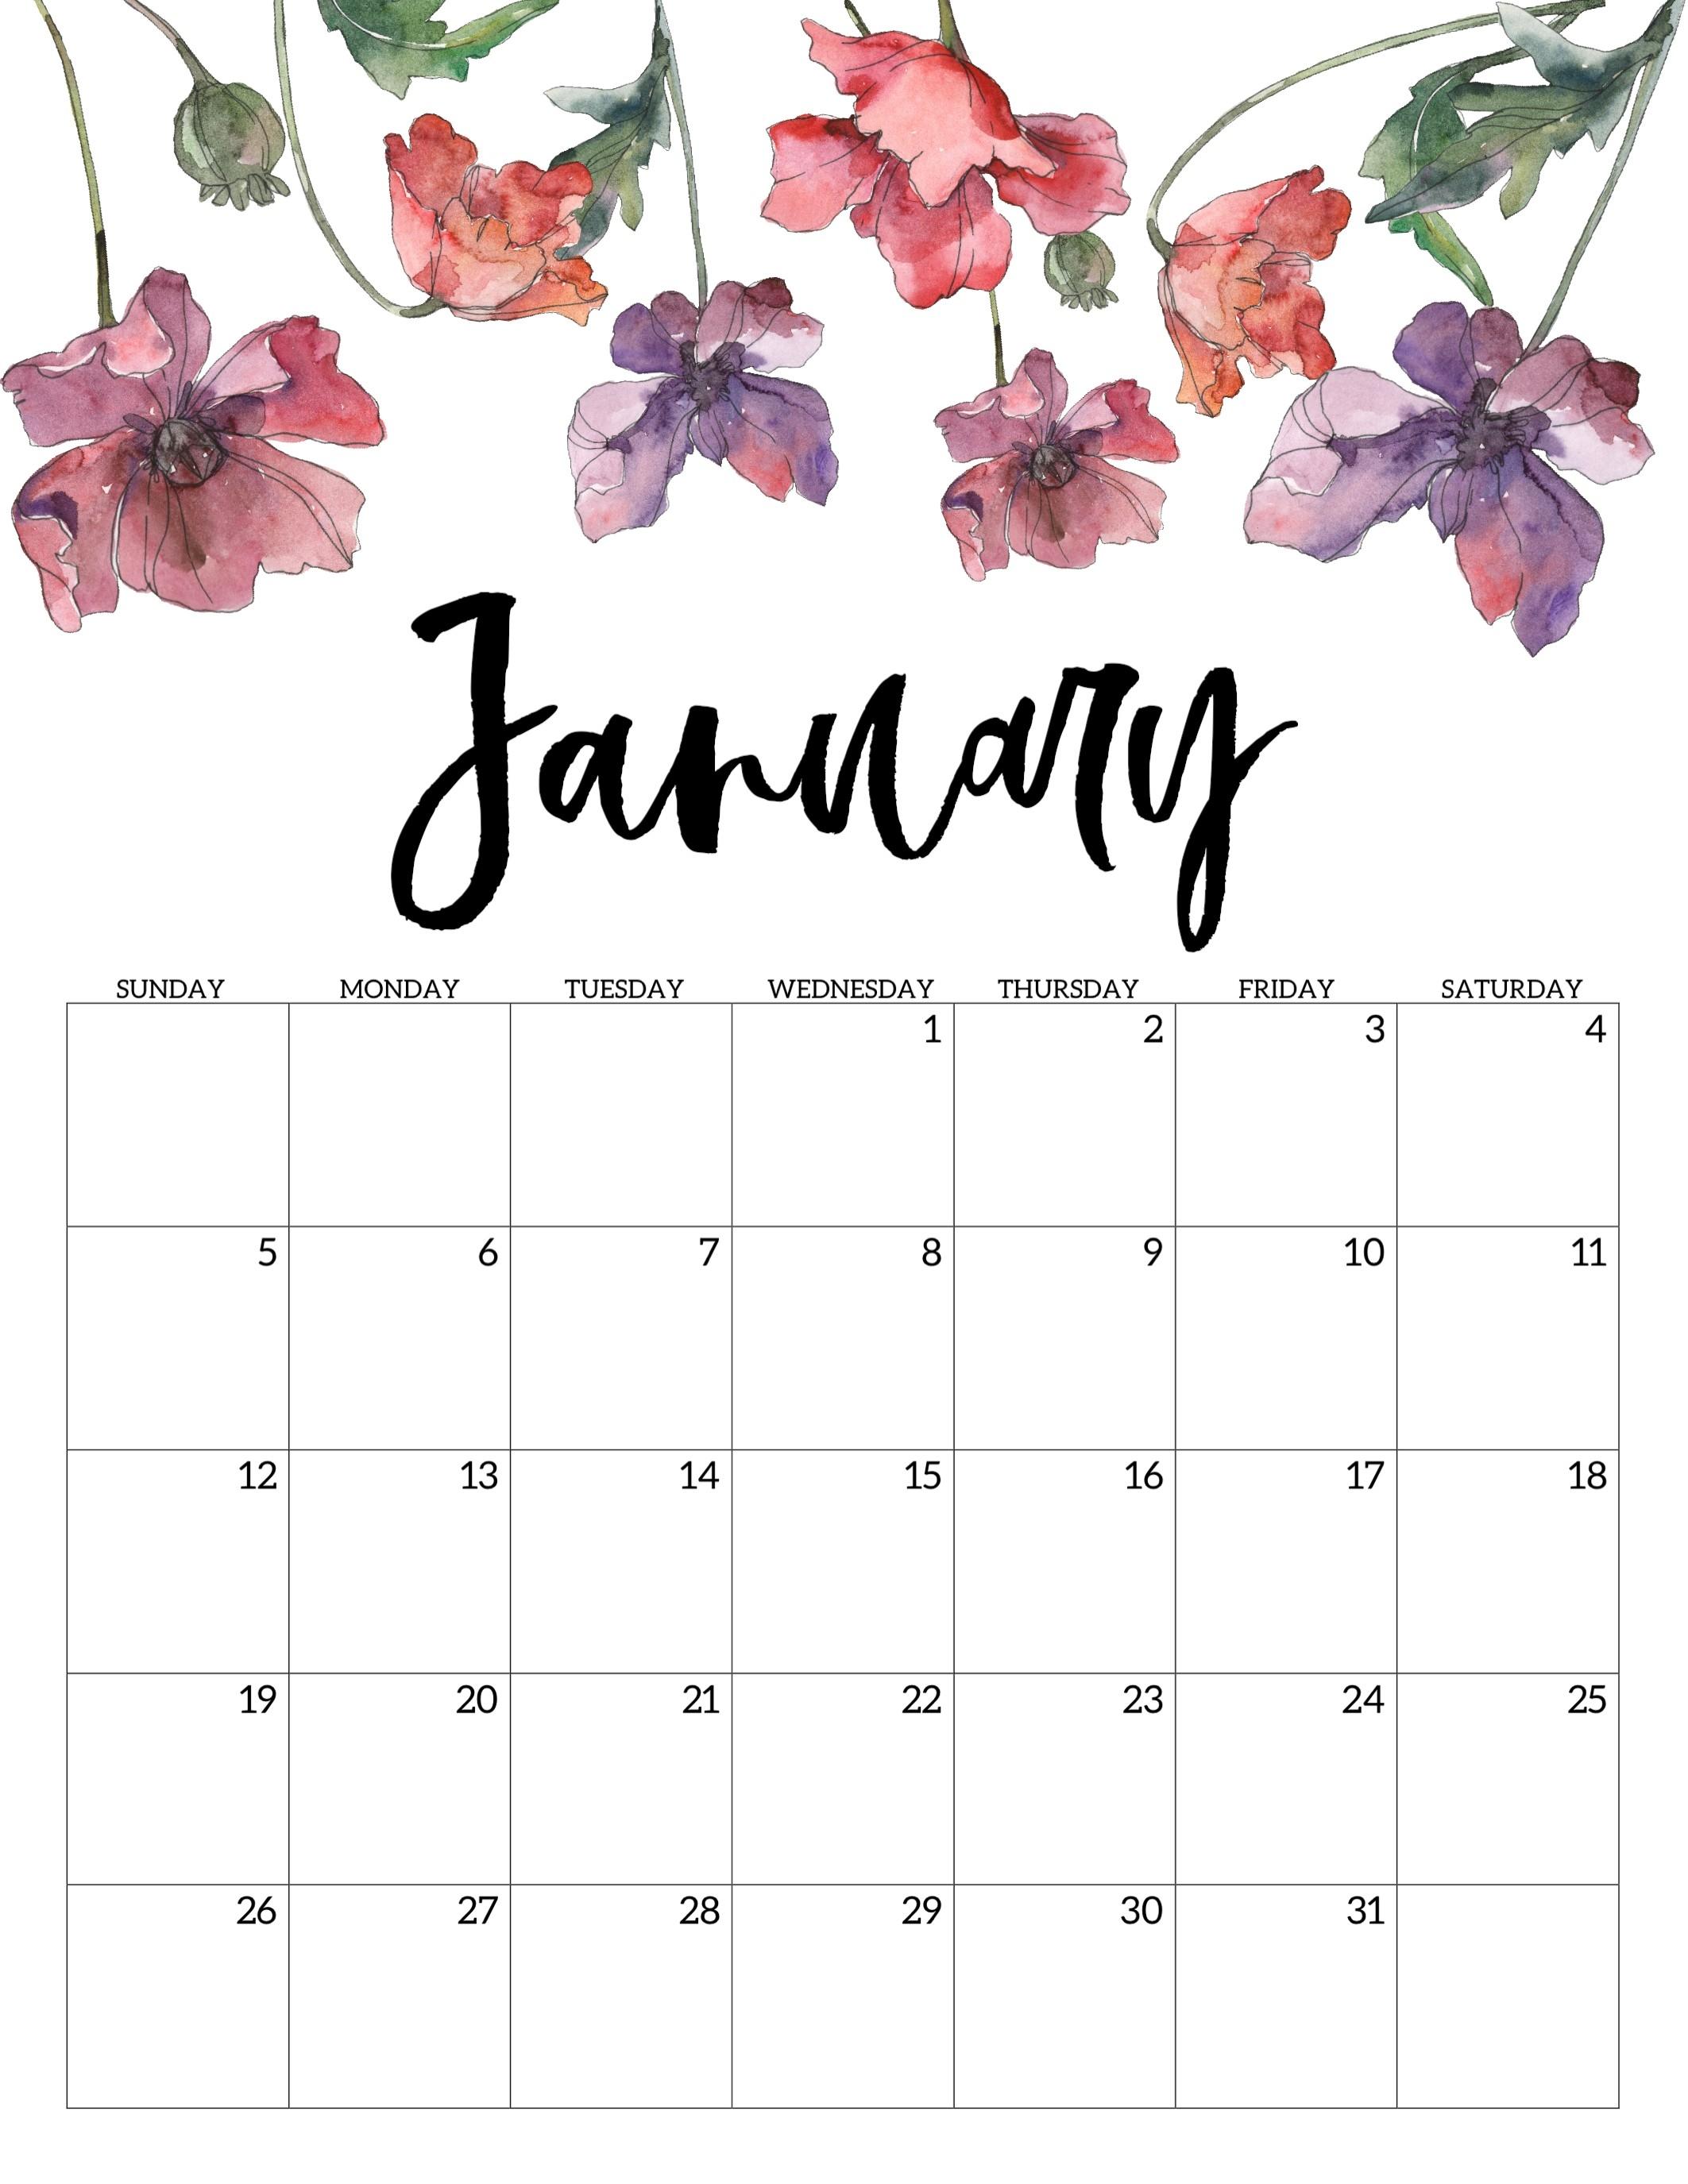 2020 Free Printable Calendar - Floral - Paper Trail Design-Pretty January 2020 Calendar